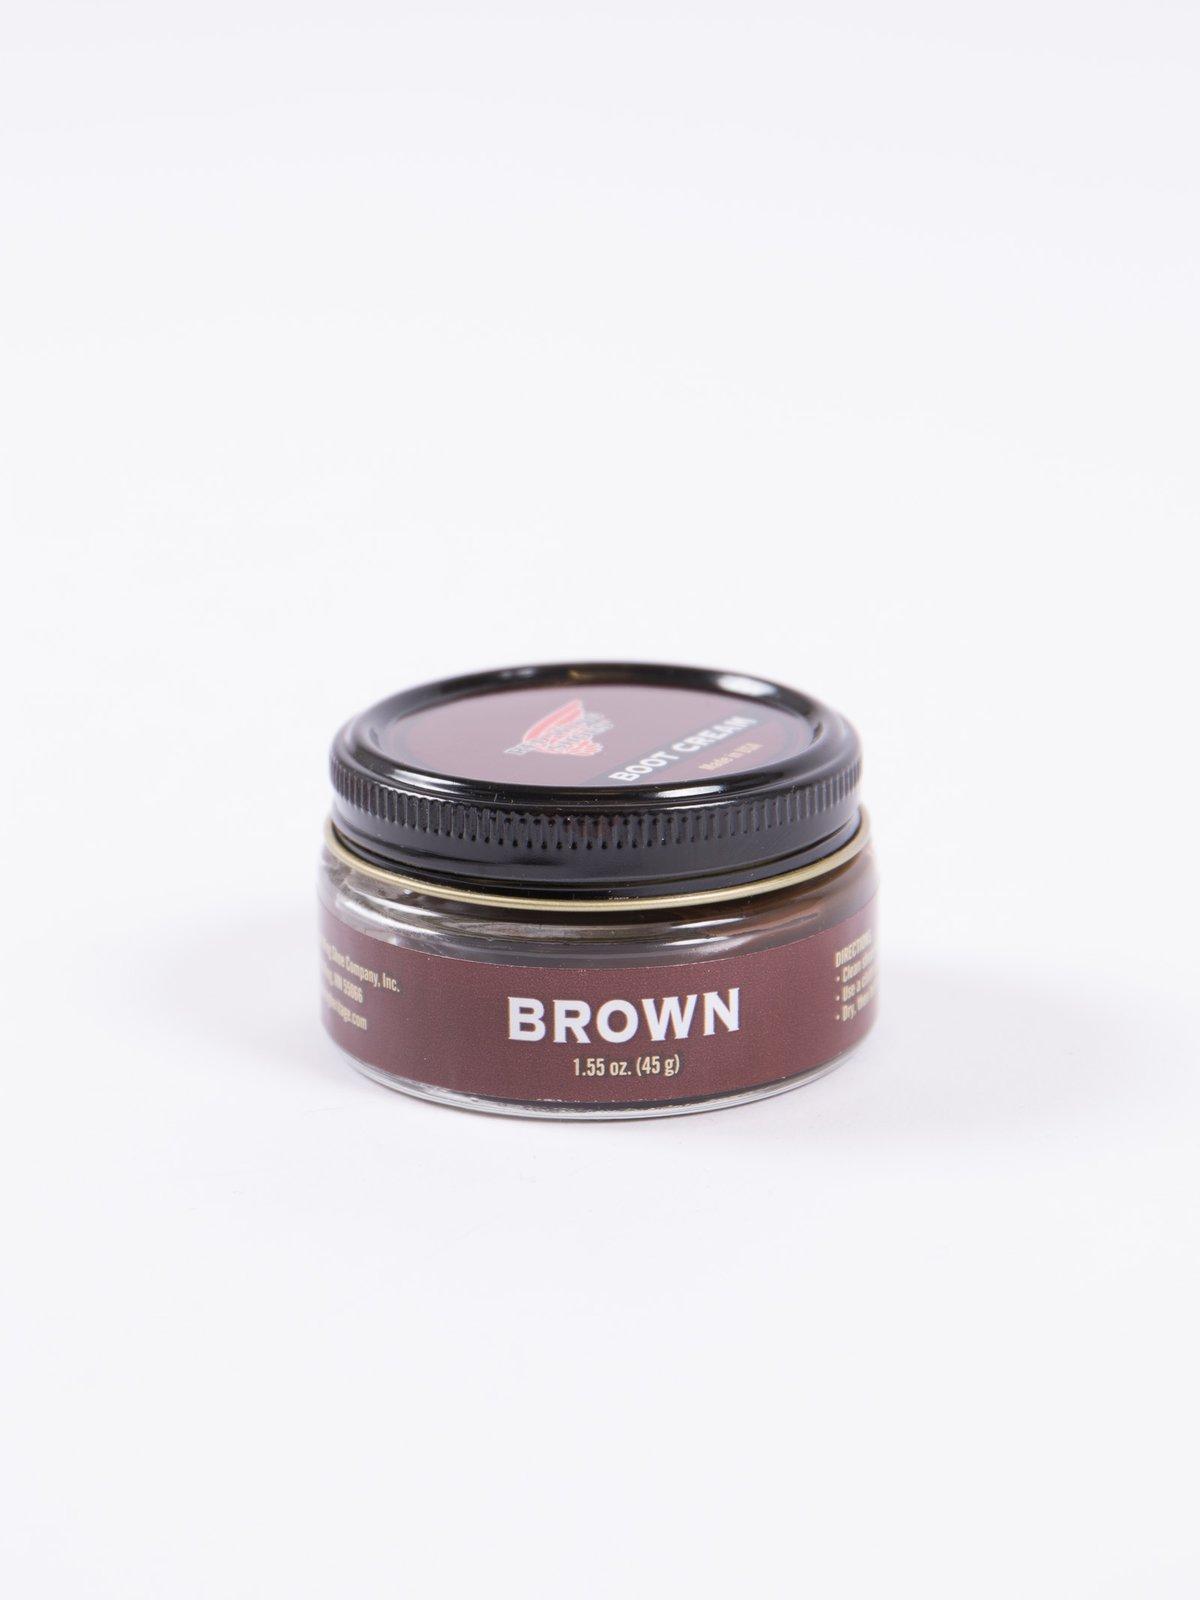 Brown Boot Cream - Image 2